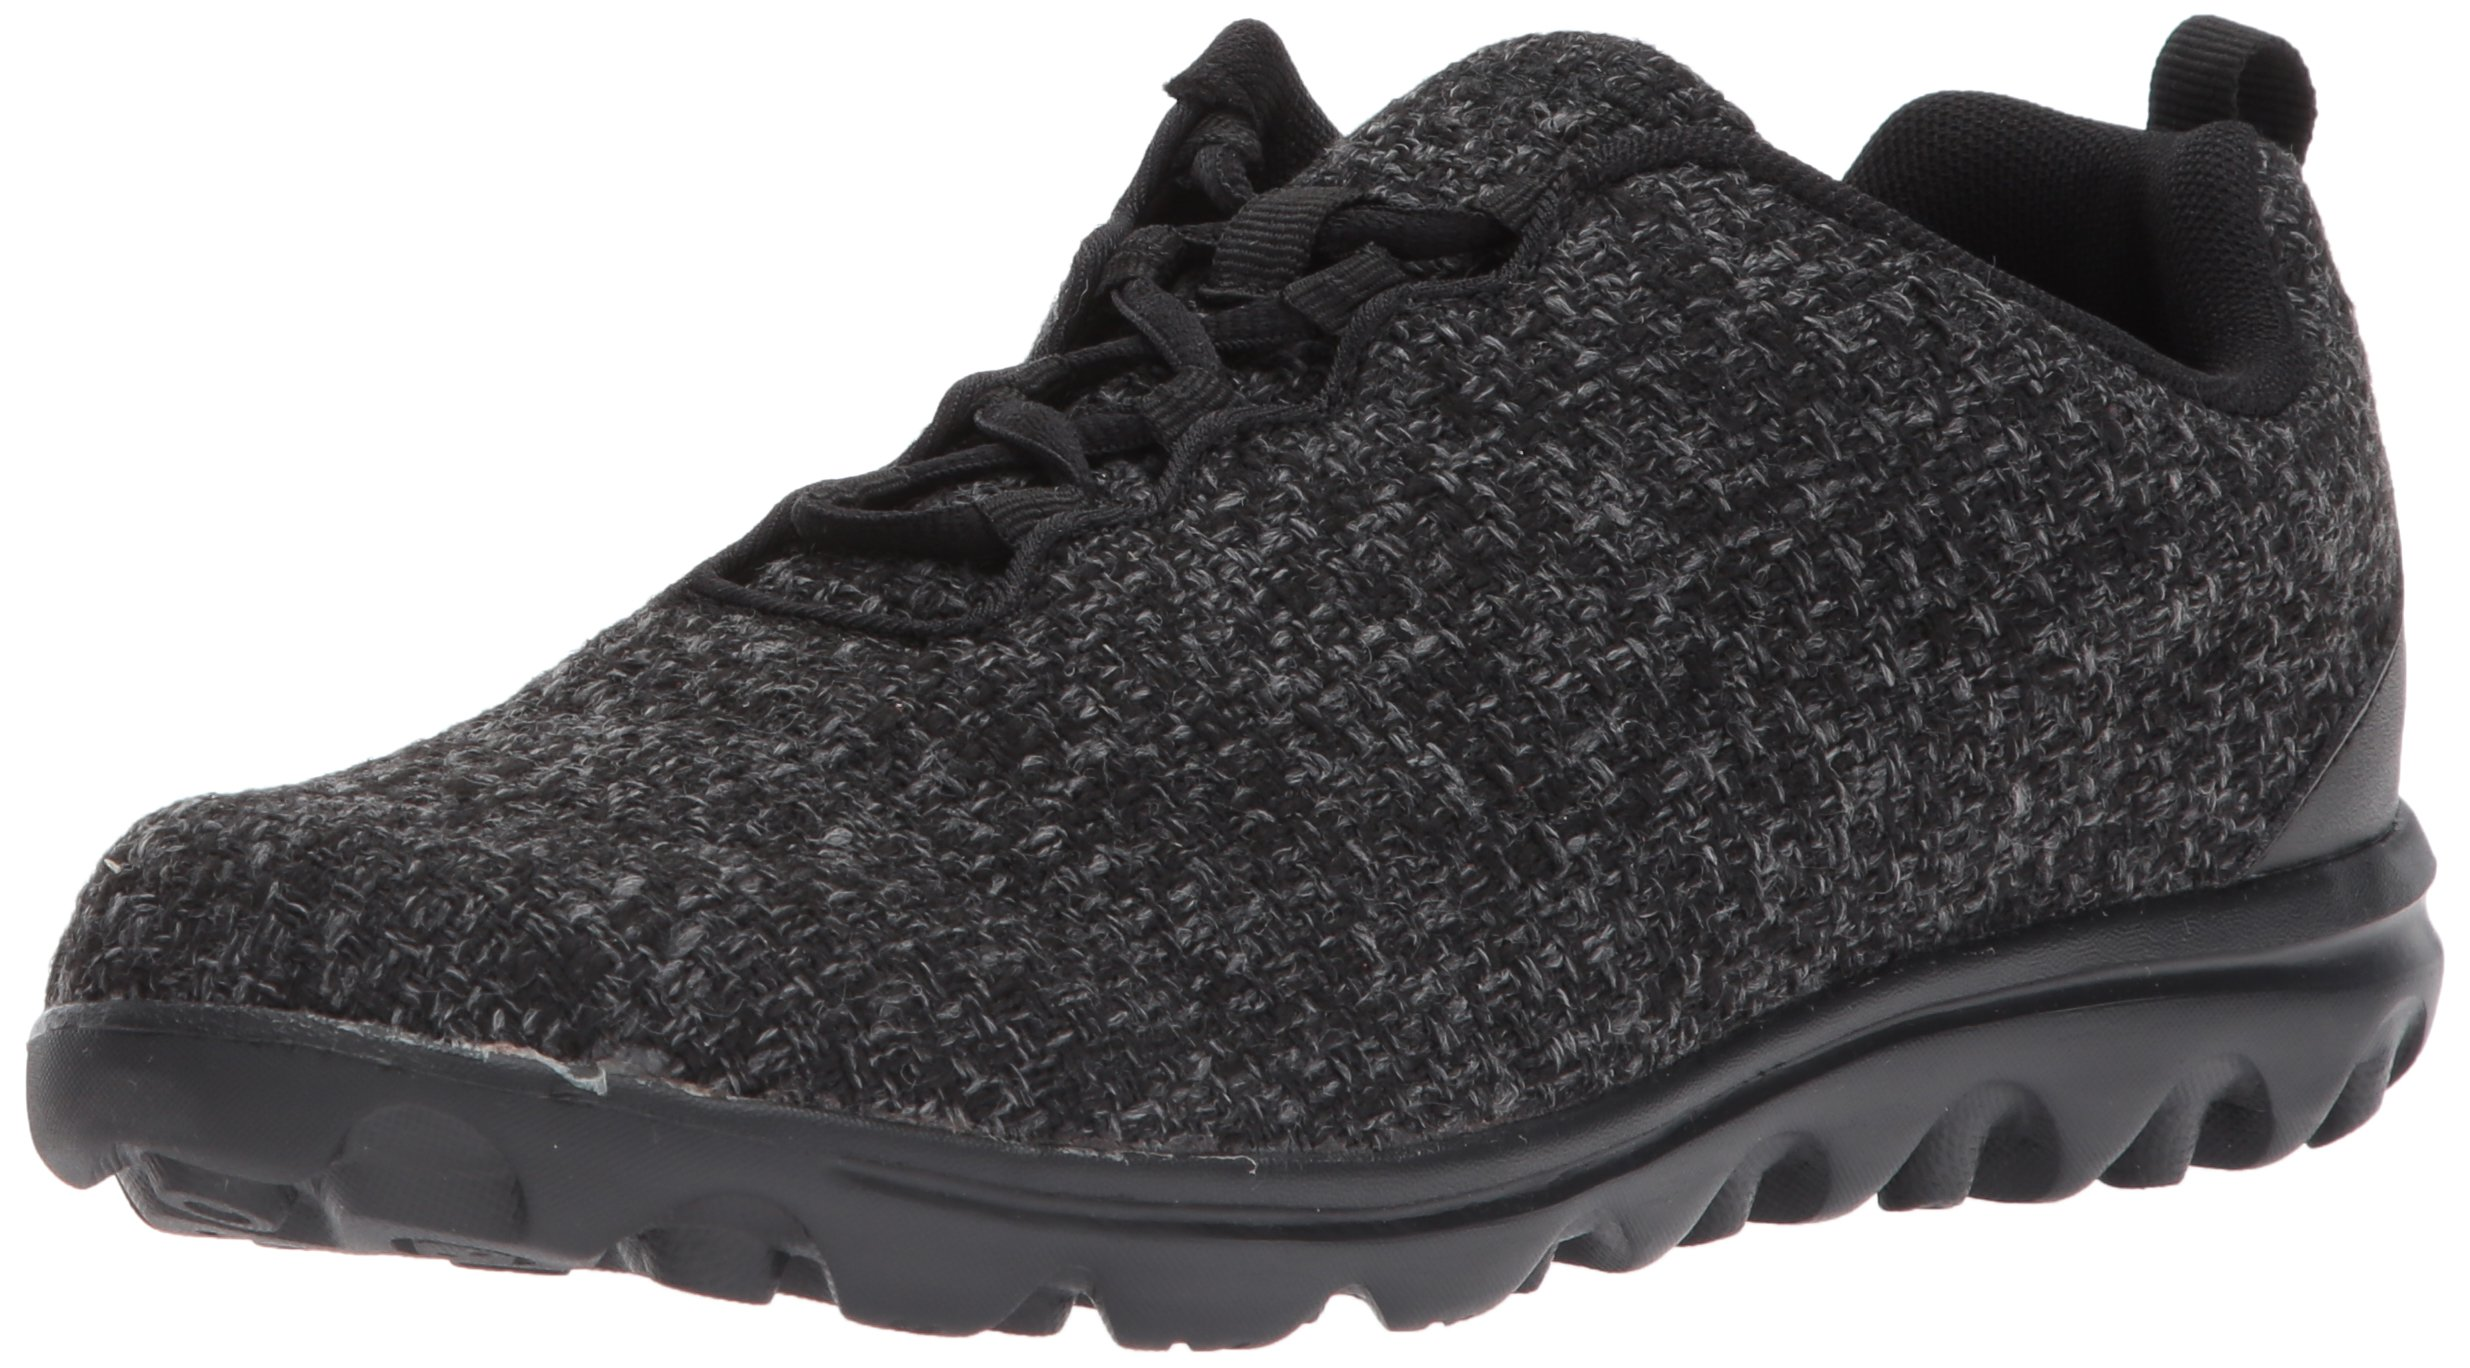 Propet Women's TravelActiv Woven Walking Shoe, Dark Grey, 10 M US